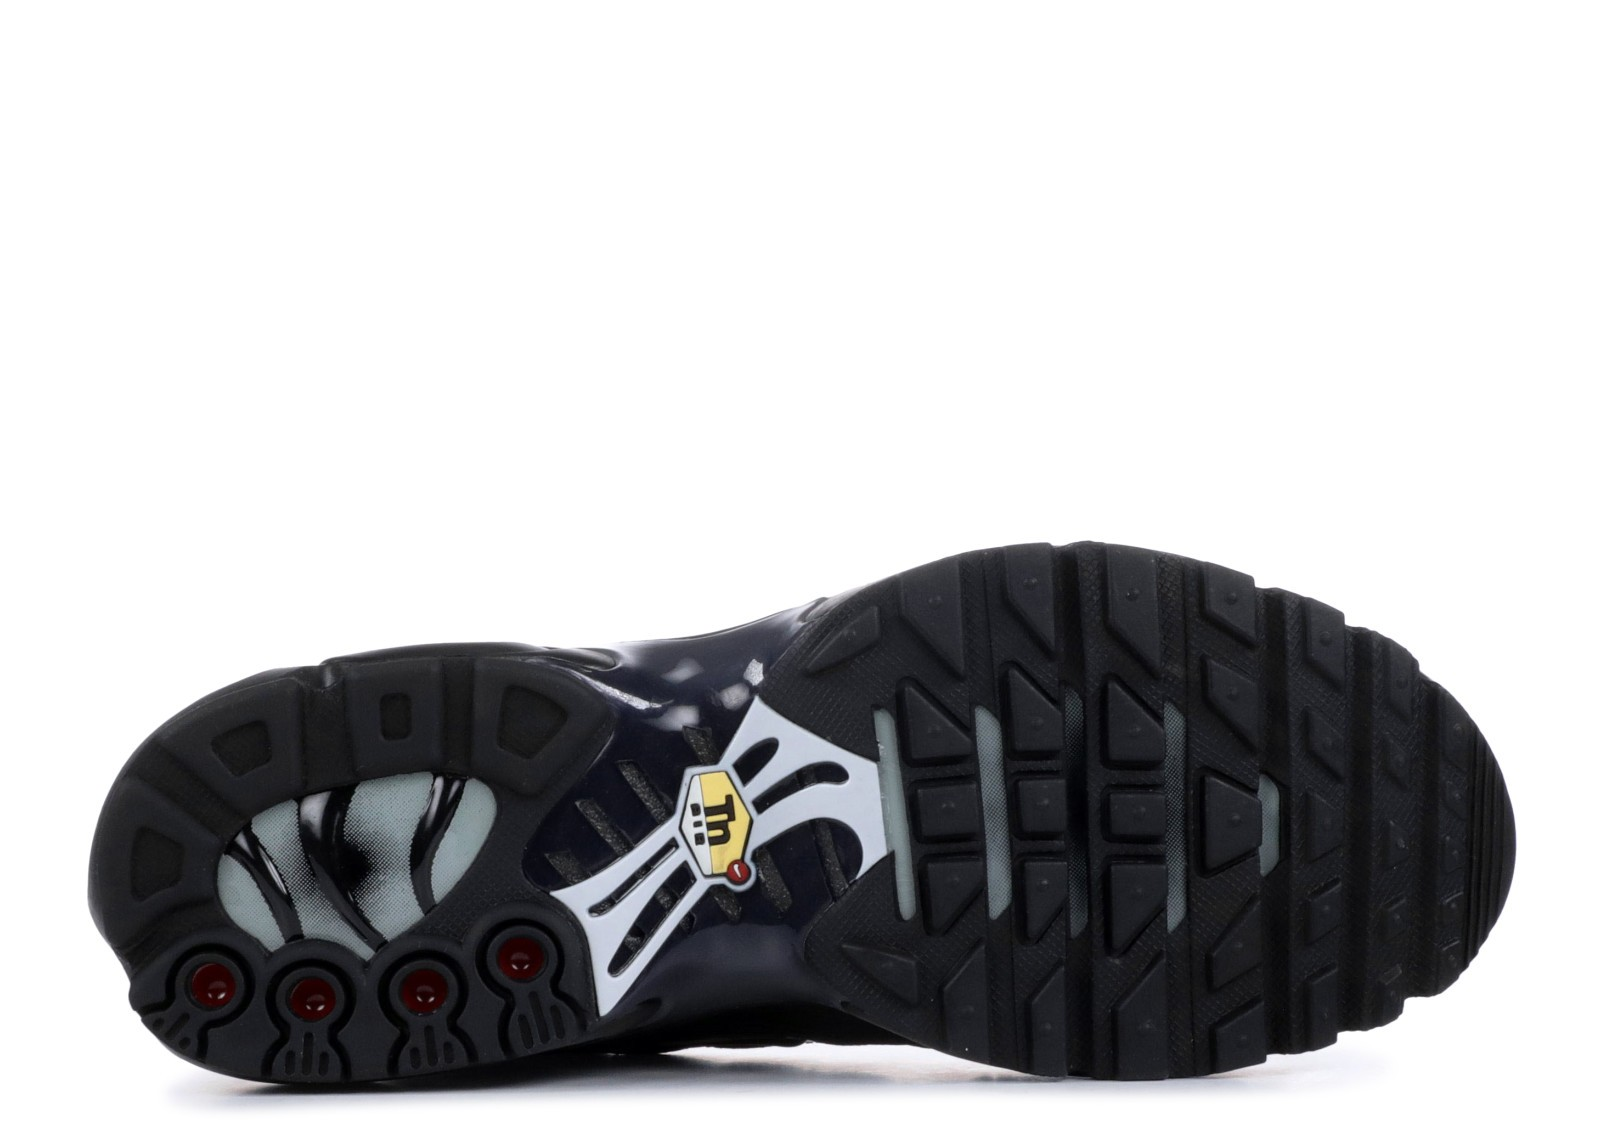 Nike Air Max 270 Dames RozeSepia StoneWitZwart AH6789 201